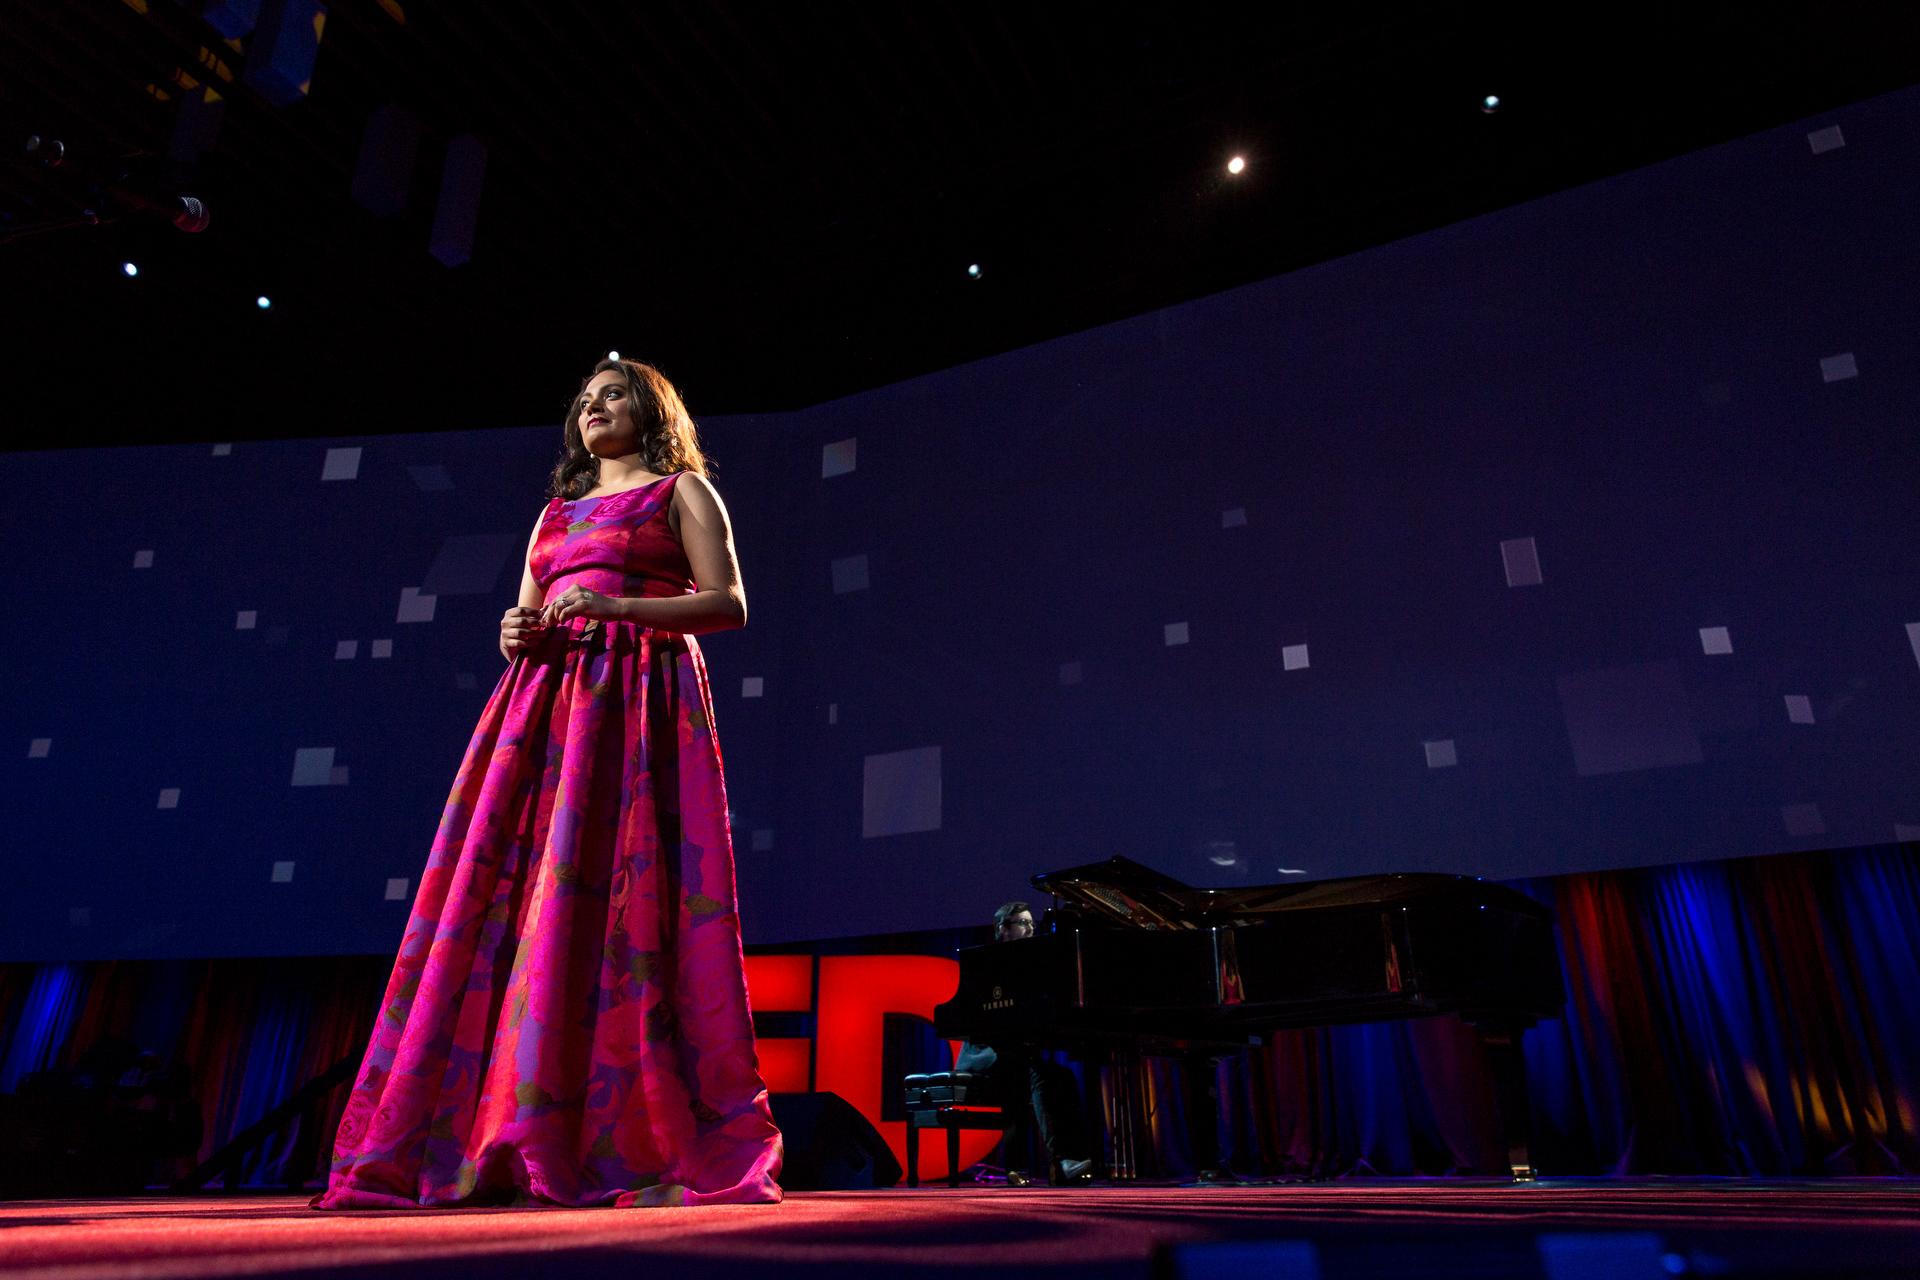 Sri Lankan opera singer Tharanga Goonetilleke, a TED Fellow, takes the stage. Photo: Bret Hartman/TED